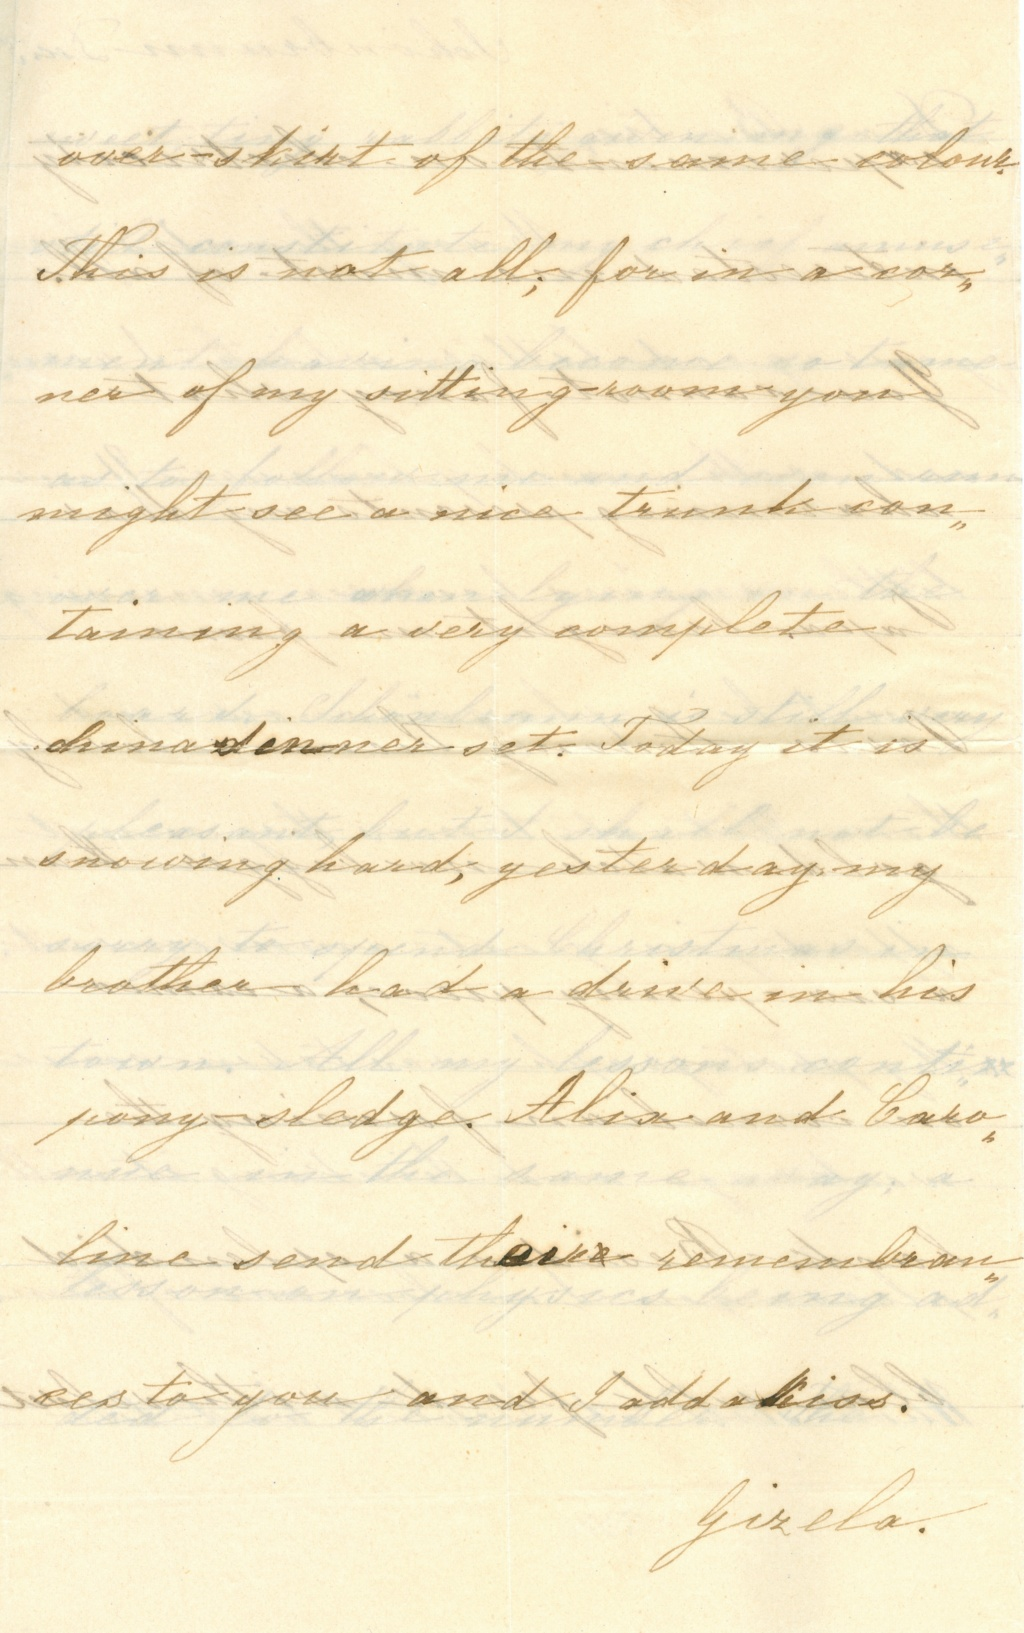 Nachtrag - Freimarken-Ausgabe 1867 : Kopfbildnis Kaiser Franz Joseph I - Seite 23 Gisela11